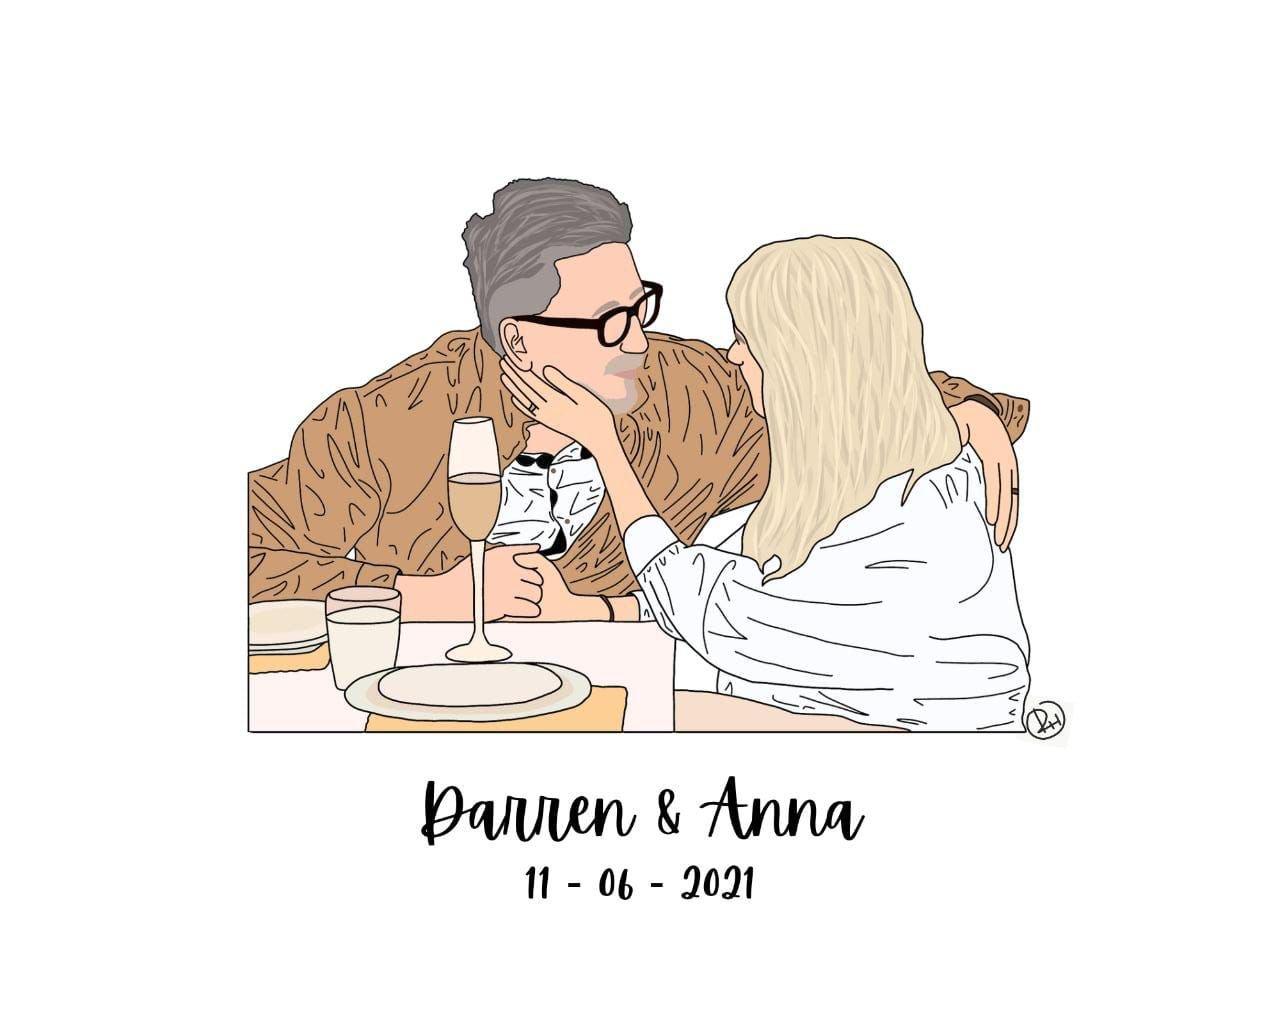 Darren and Anna